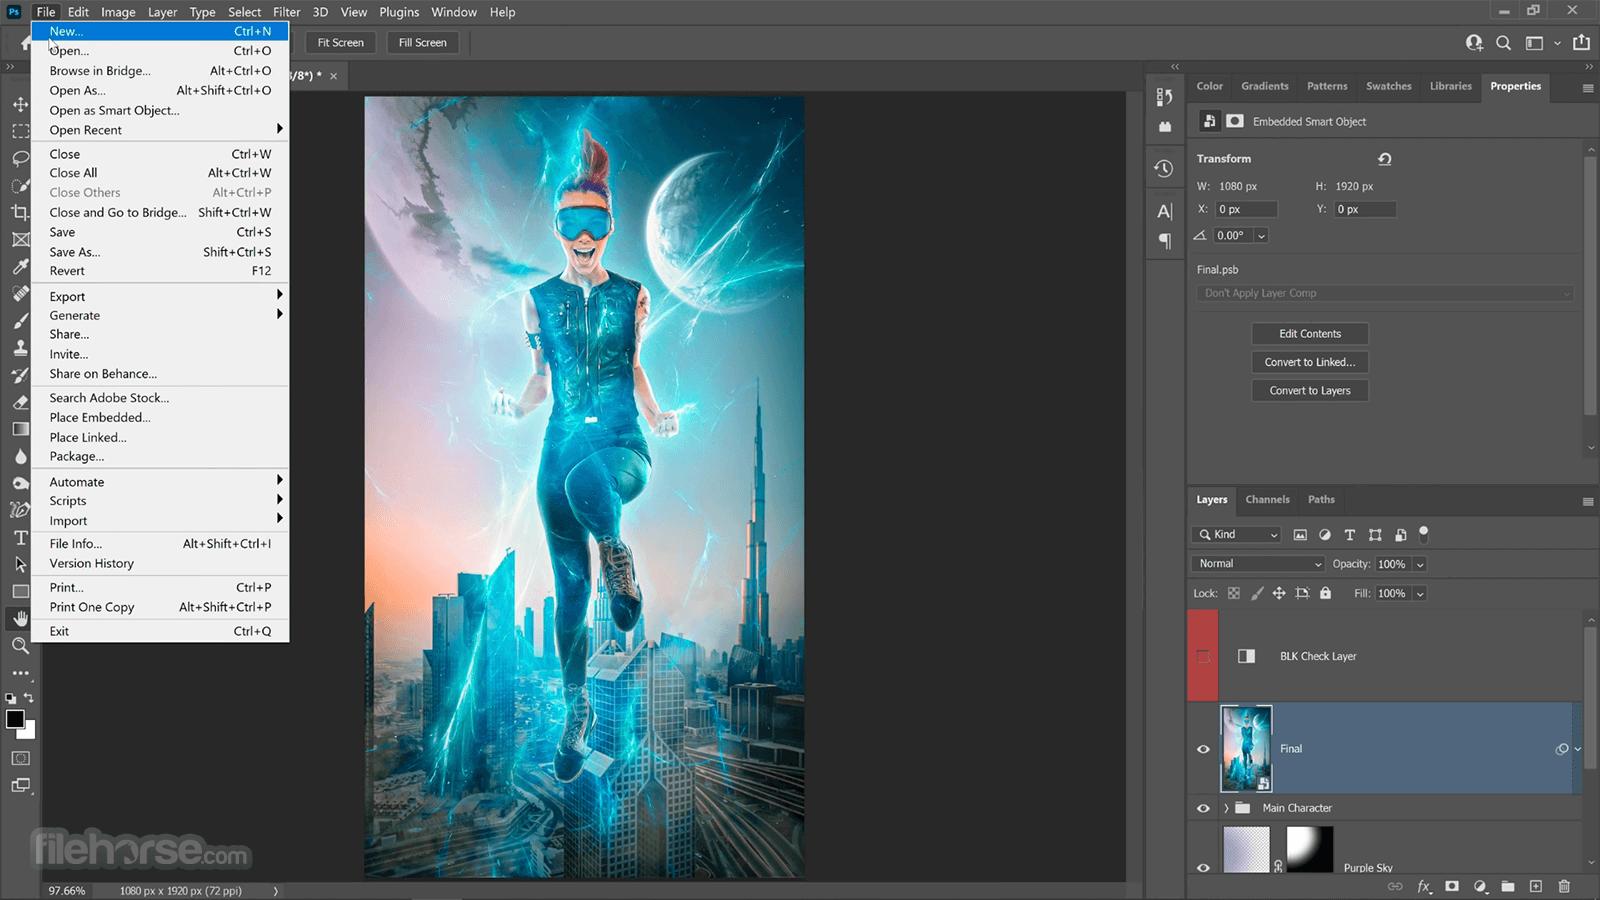 Adobe photoshop cc free. download full version